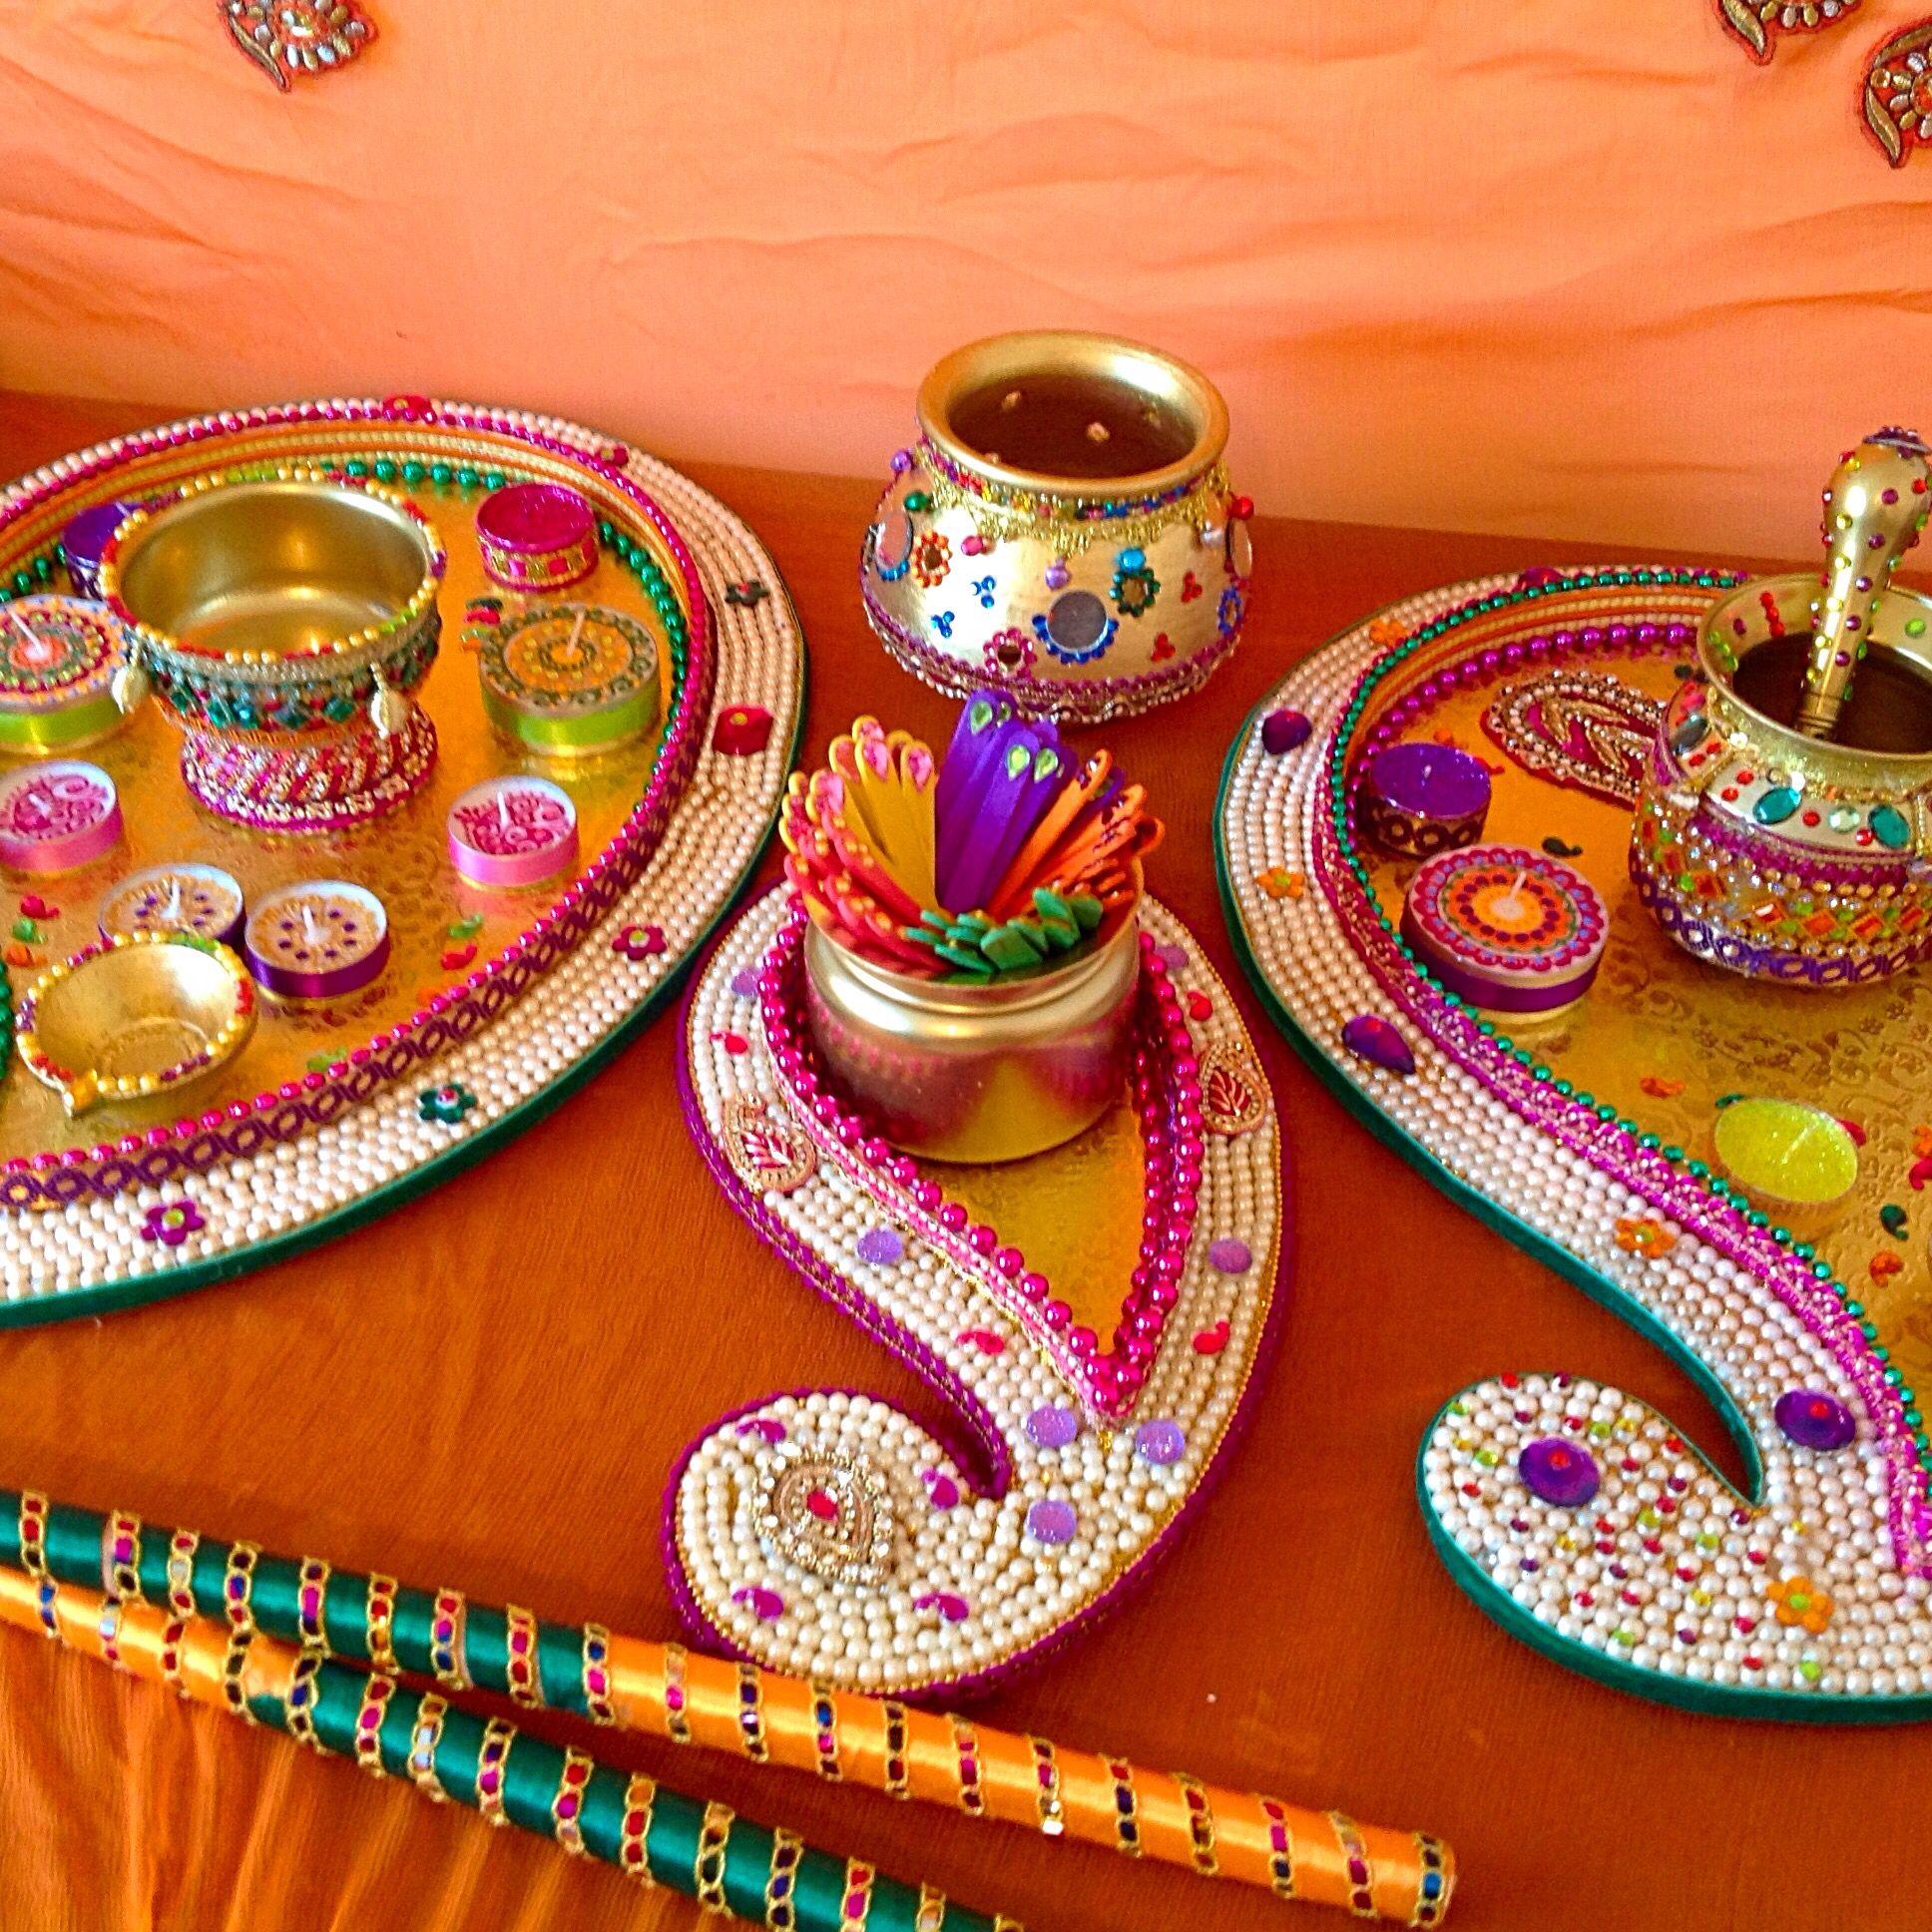 Mehndi Decoration Ideas Facebook : Beautiful large paisley shaped mehndi plate these are